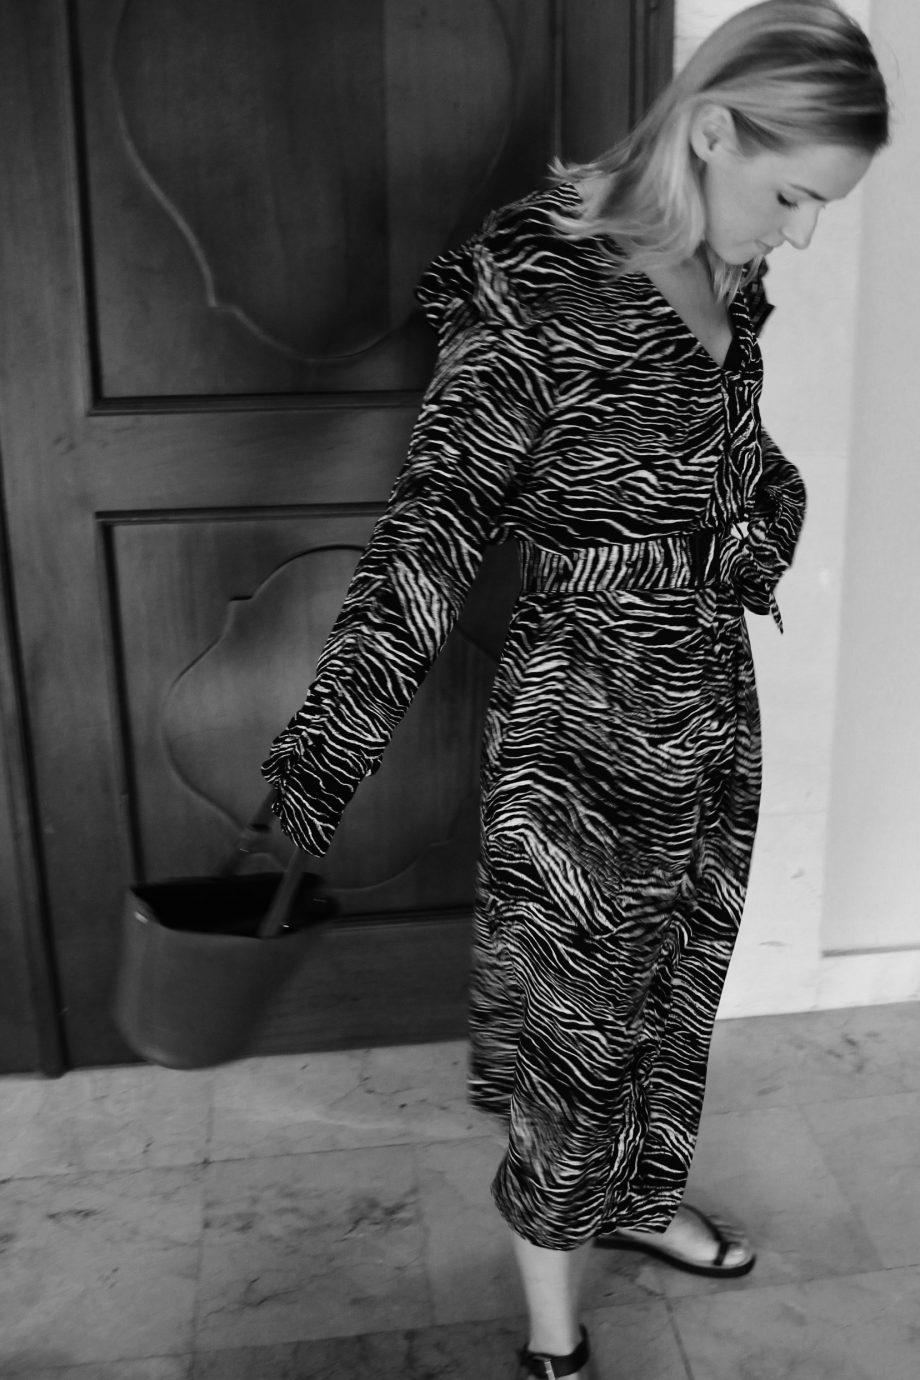 Zebra Dress |31.01.2017